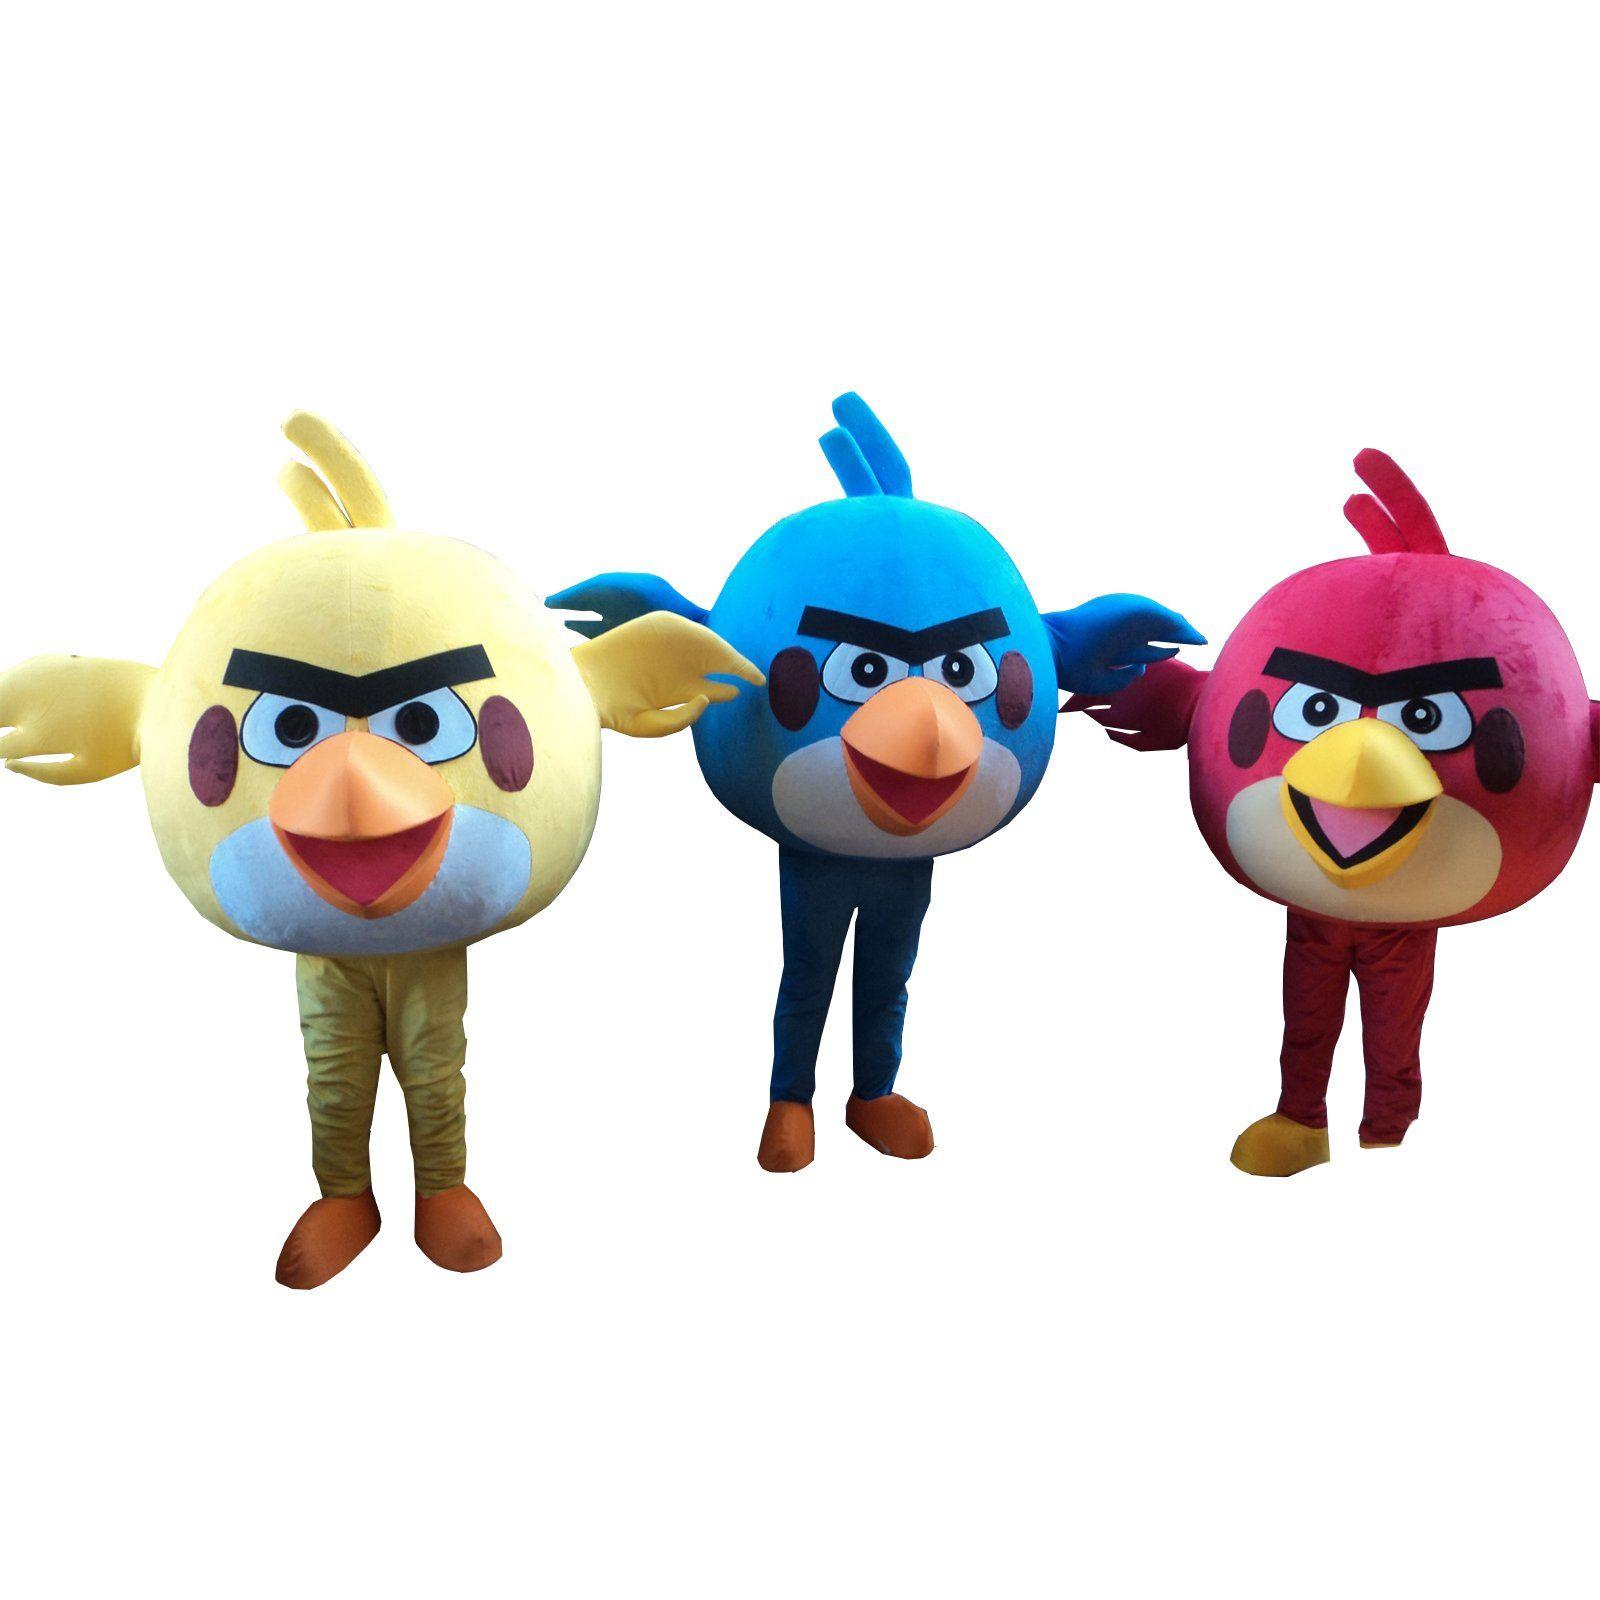 Angry birds bird halloween adult mascot costume fancy